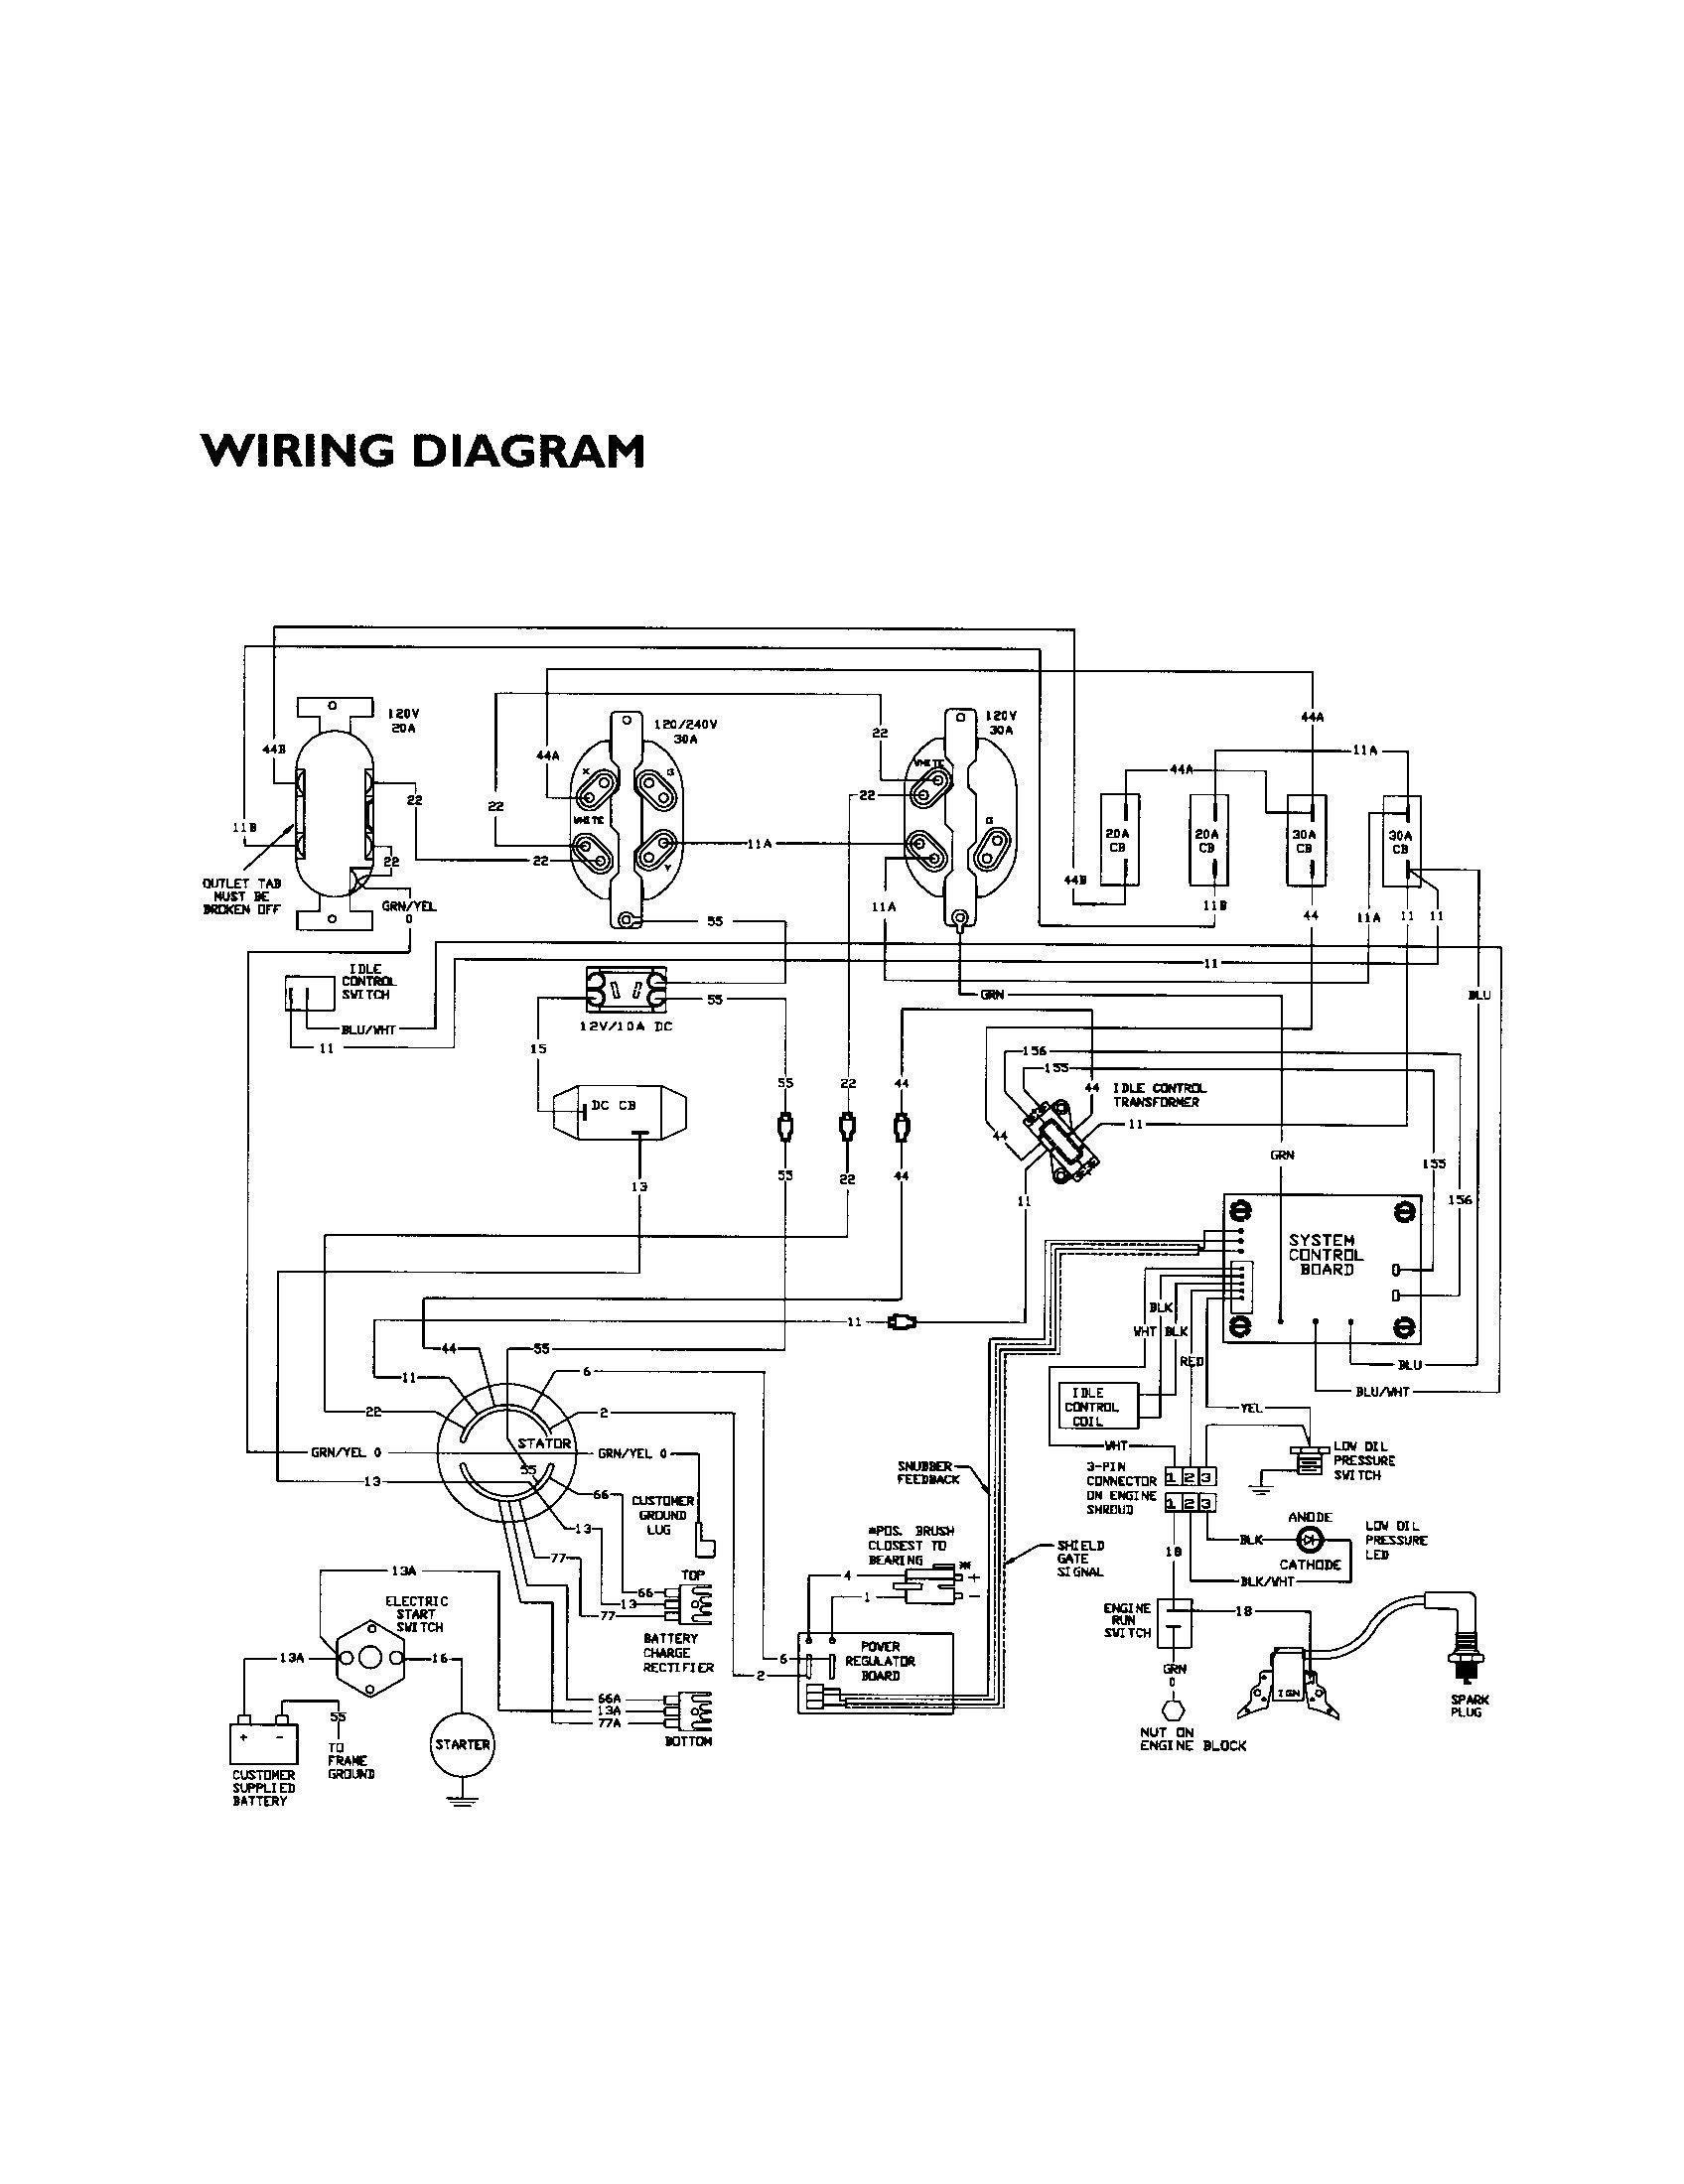 2005 International 4400 Wiring Diagrams